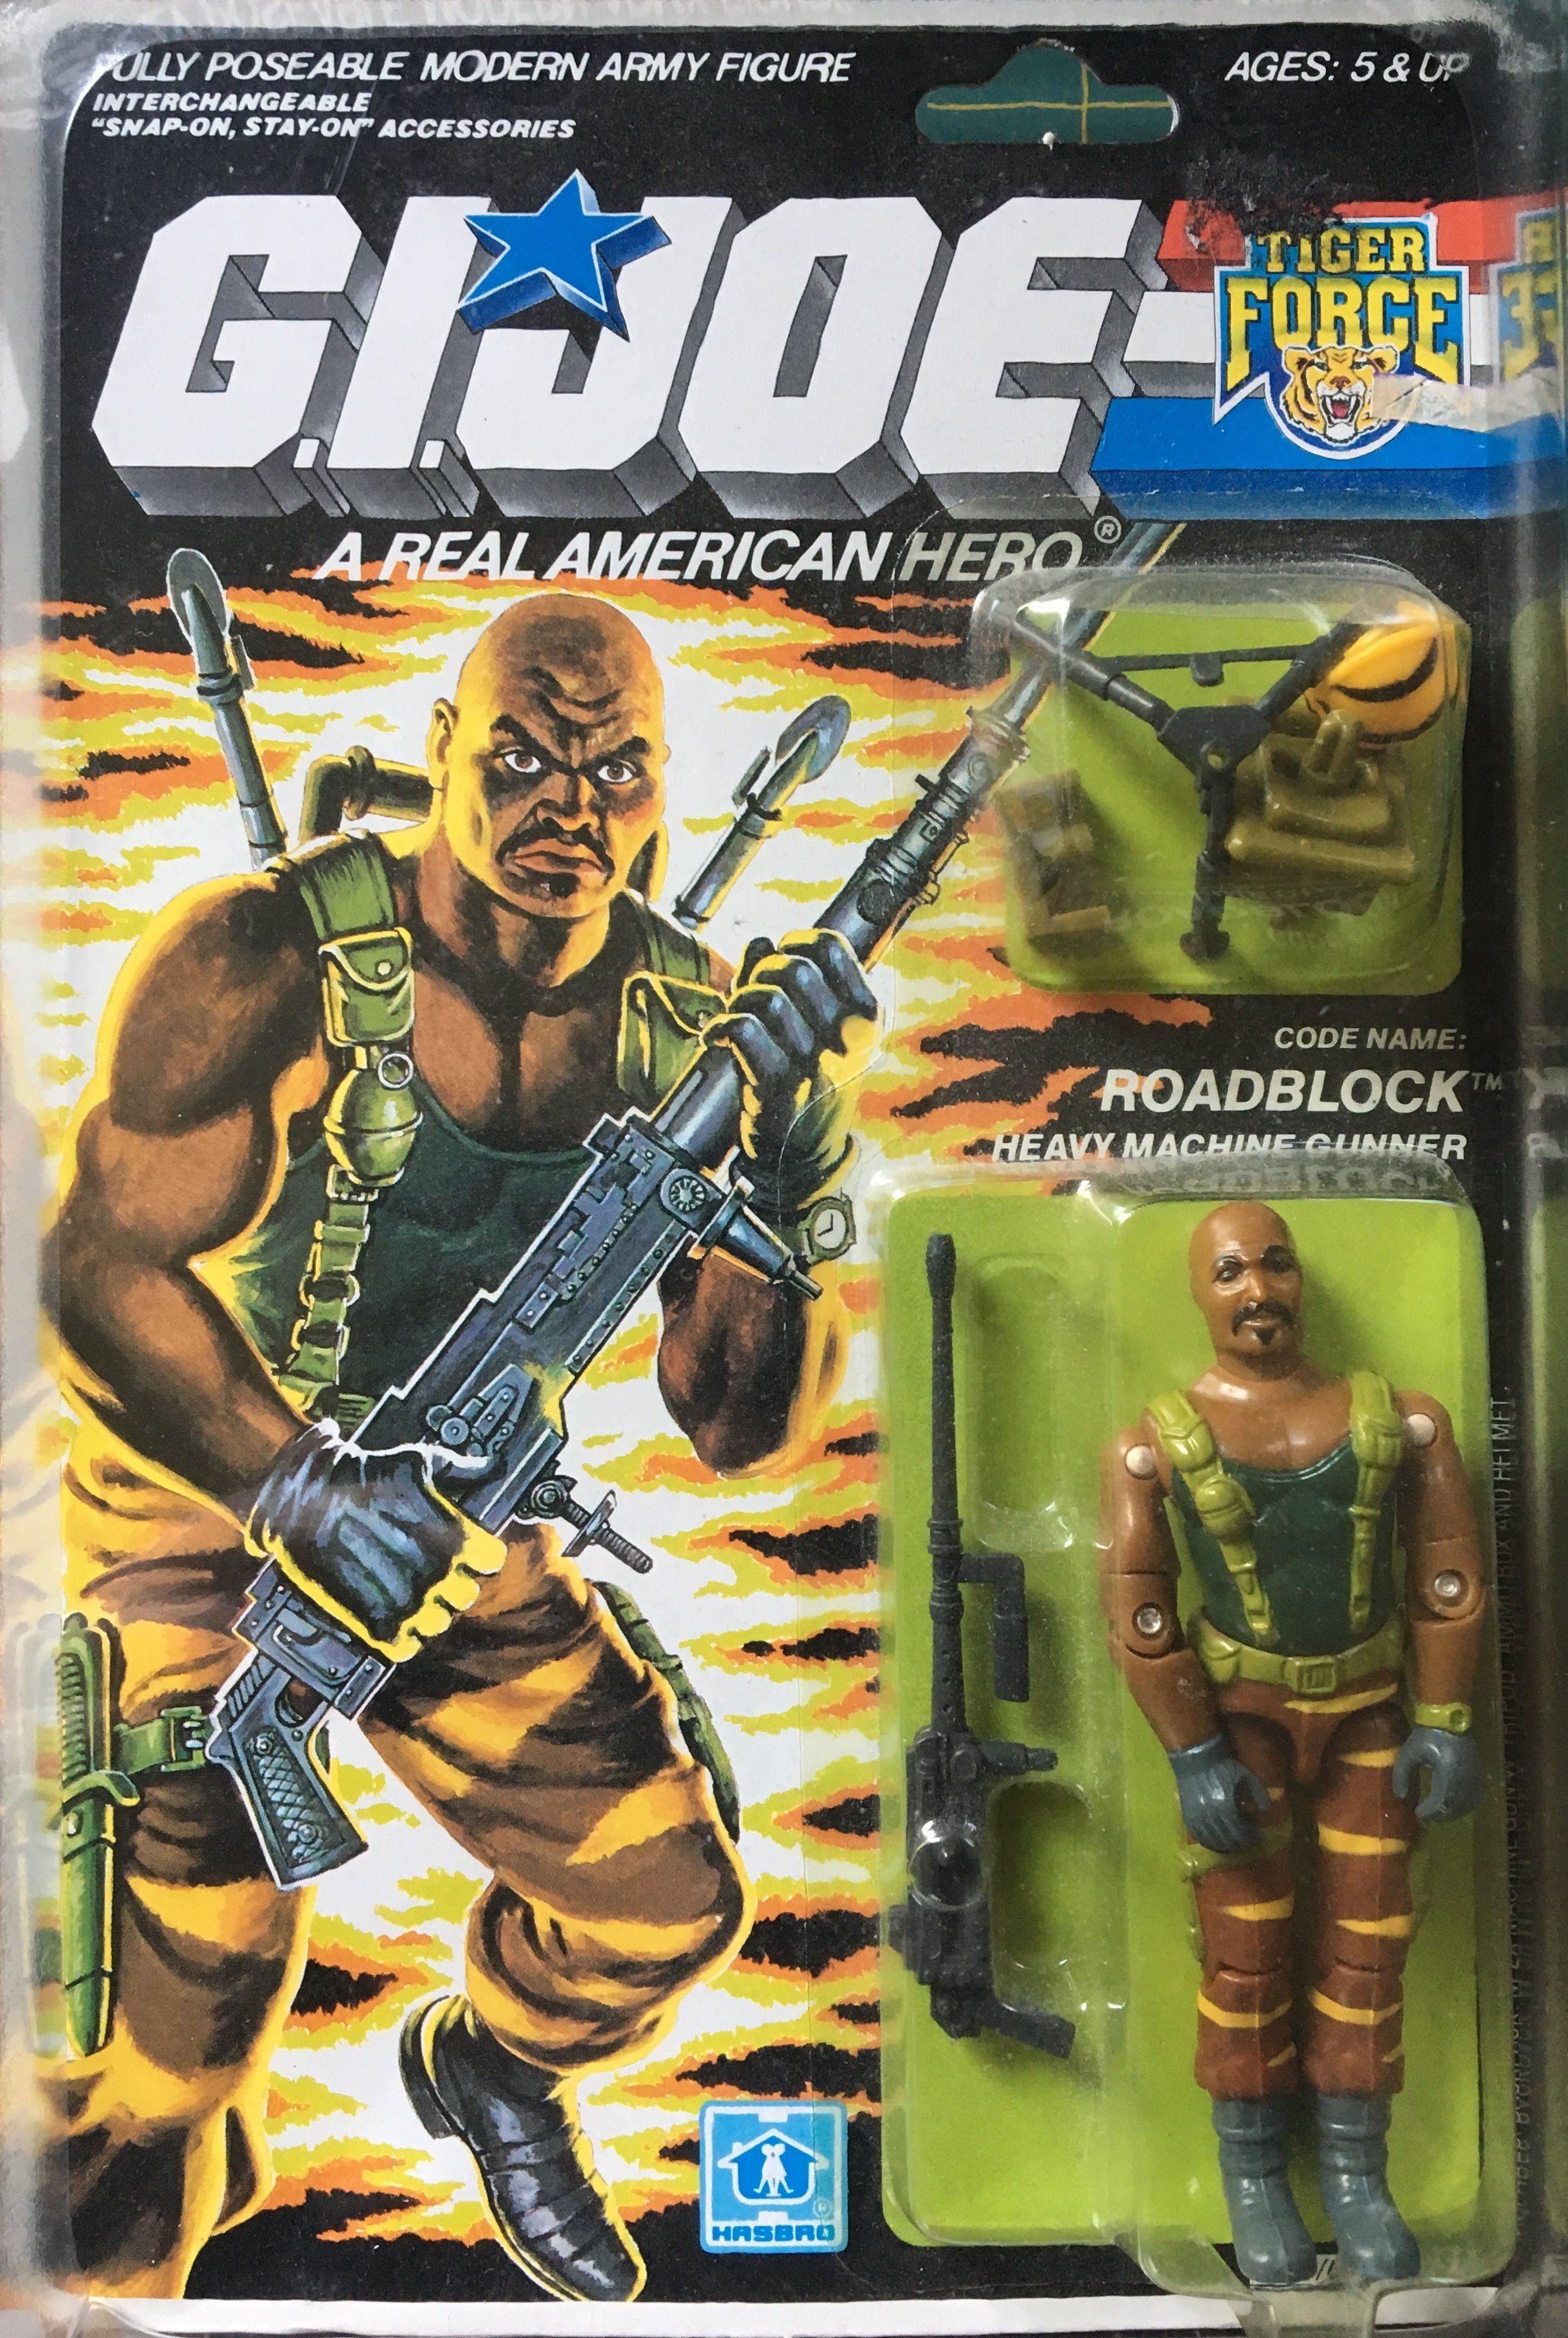 GI Joe Weapon Tiger Force Duke Backpack 1988 Original Figure Accessory